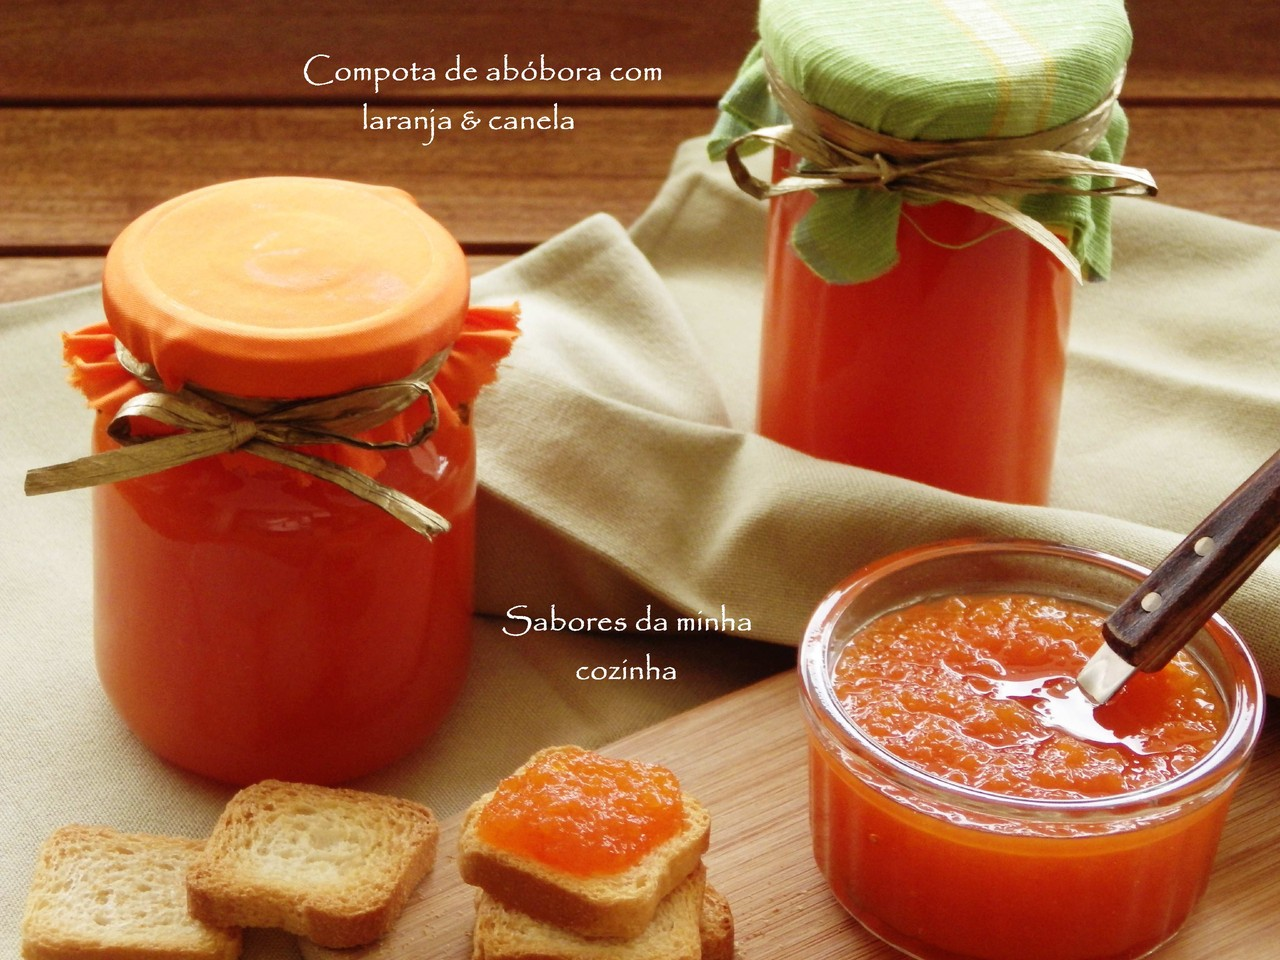 IMGP4310-Doce de abóbora com laranja e canela-Blo